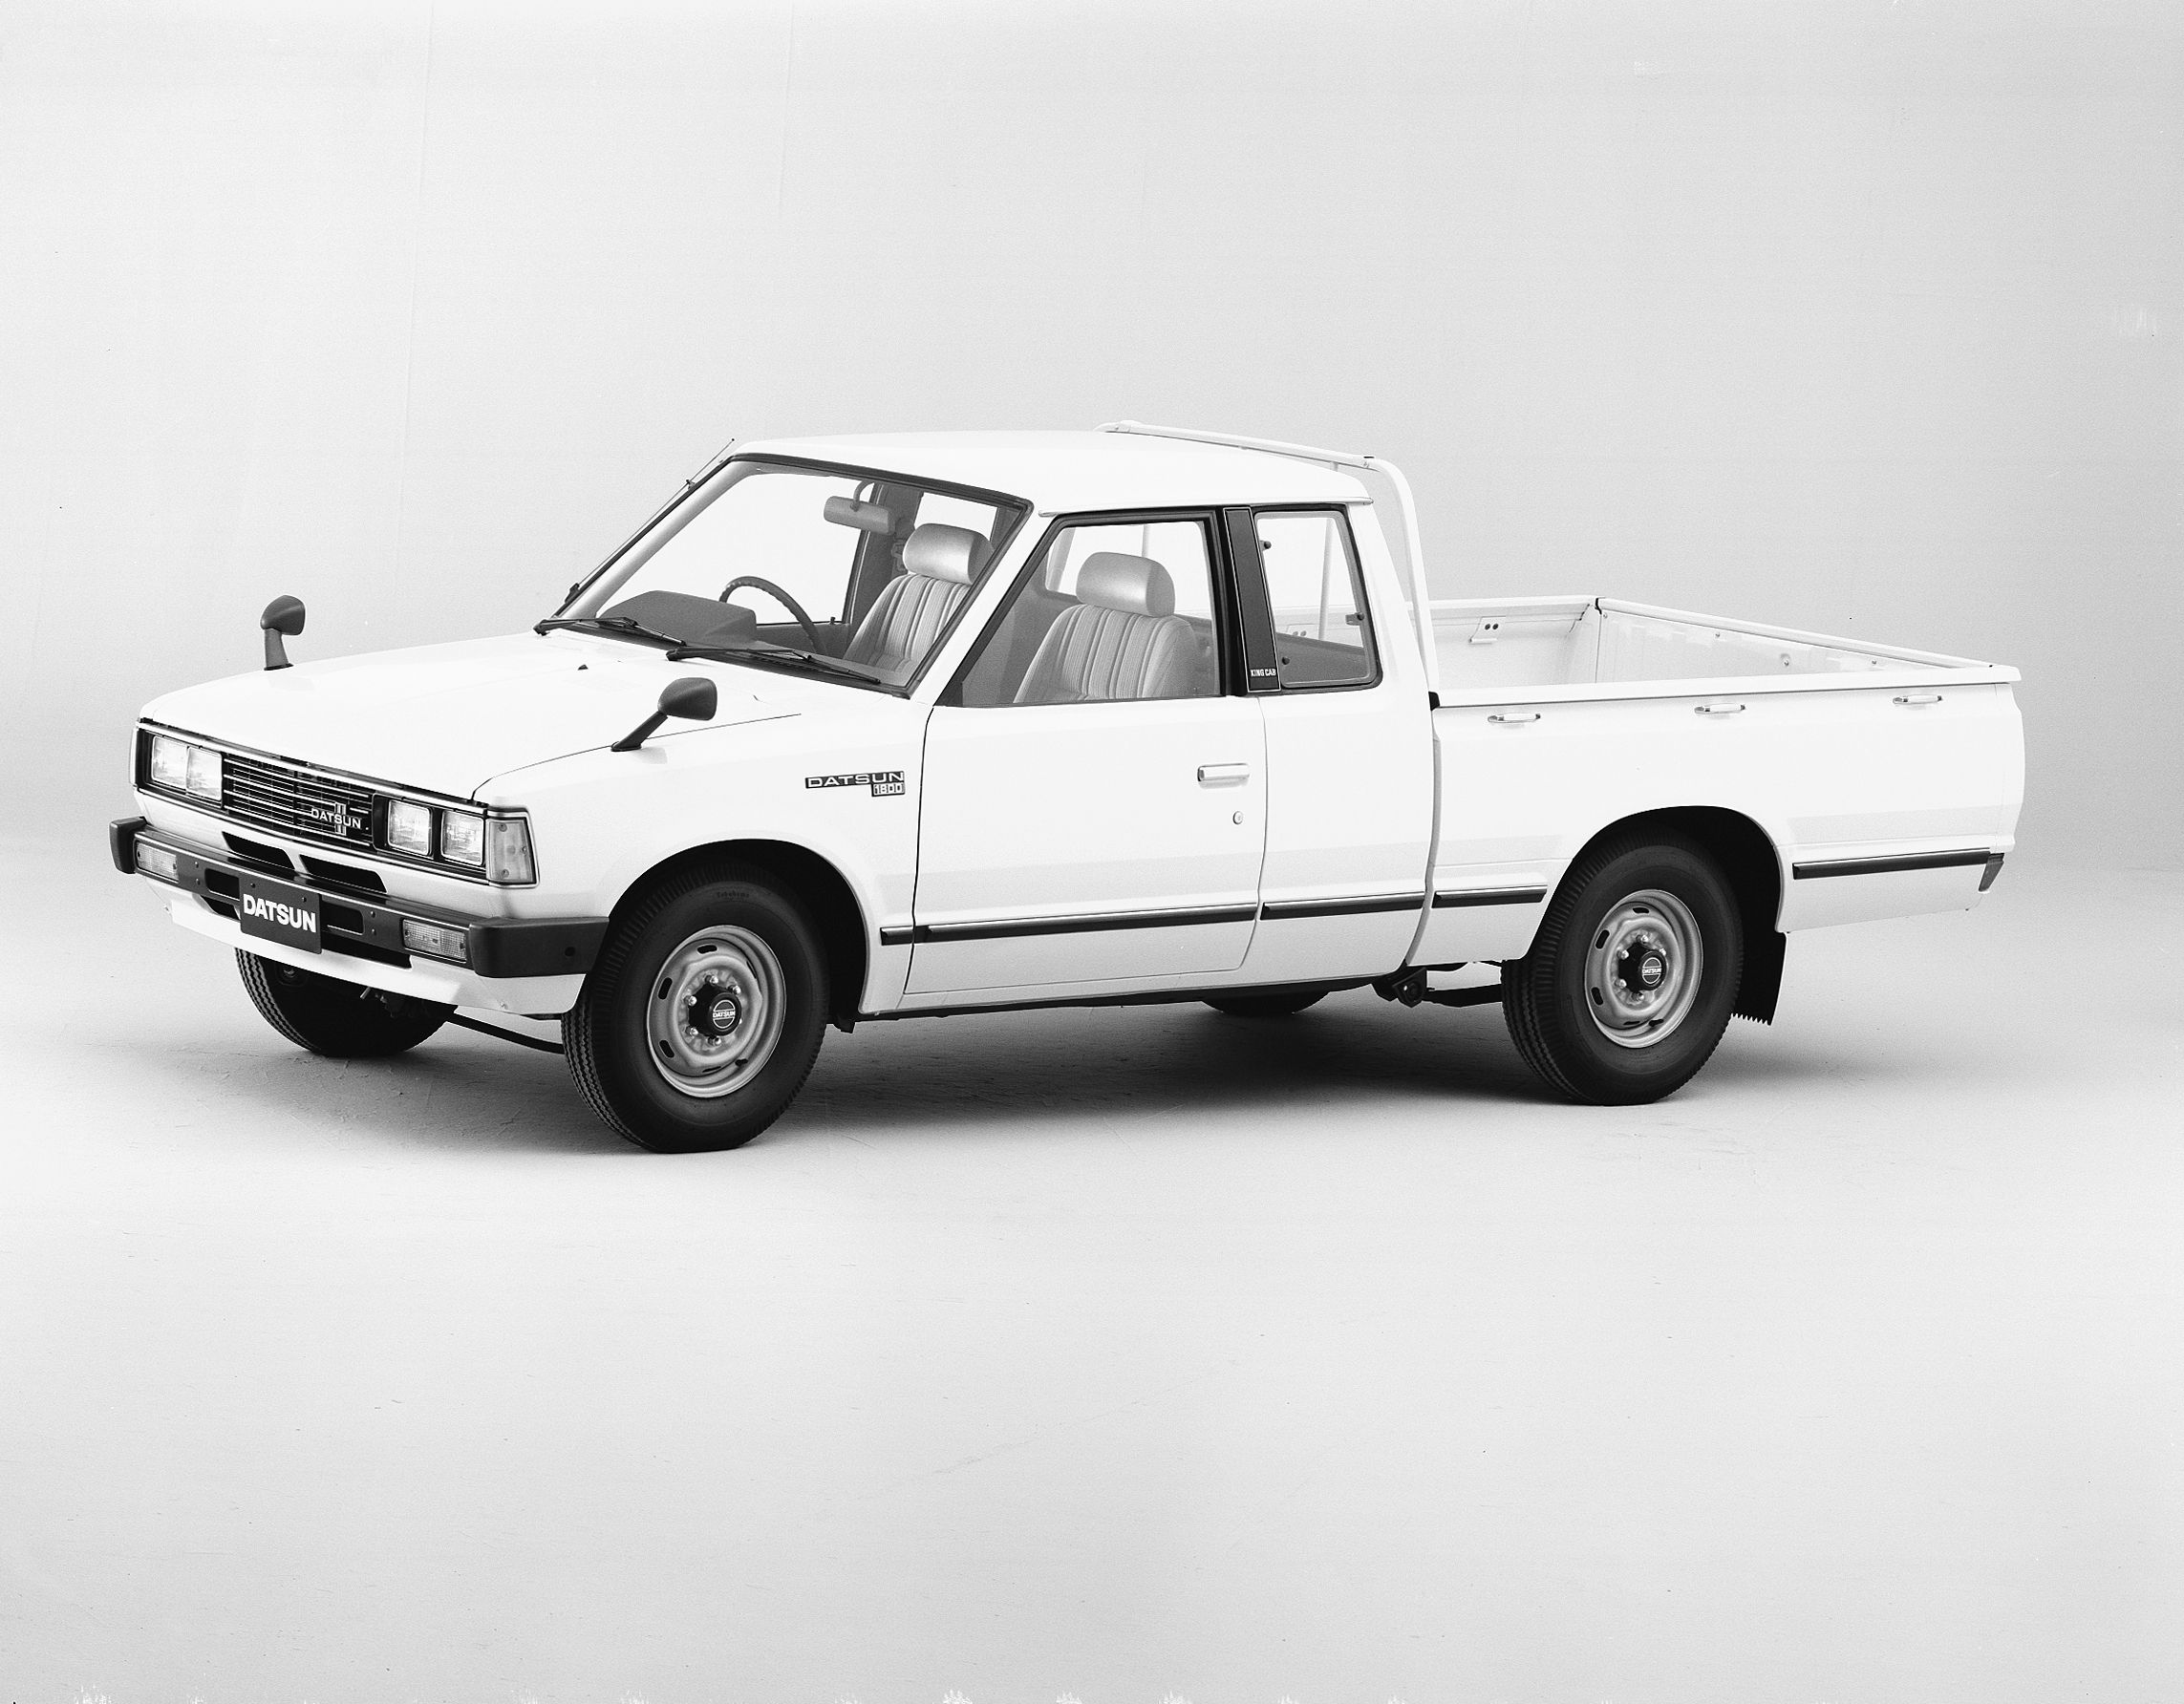 Datsun Pickup King Cab Jp Spec 720 1979 85 Пикап Автомобиль